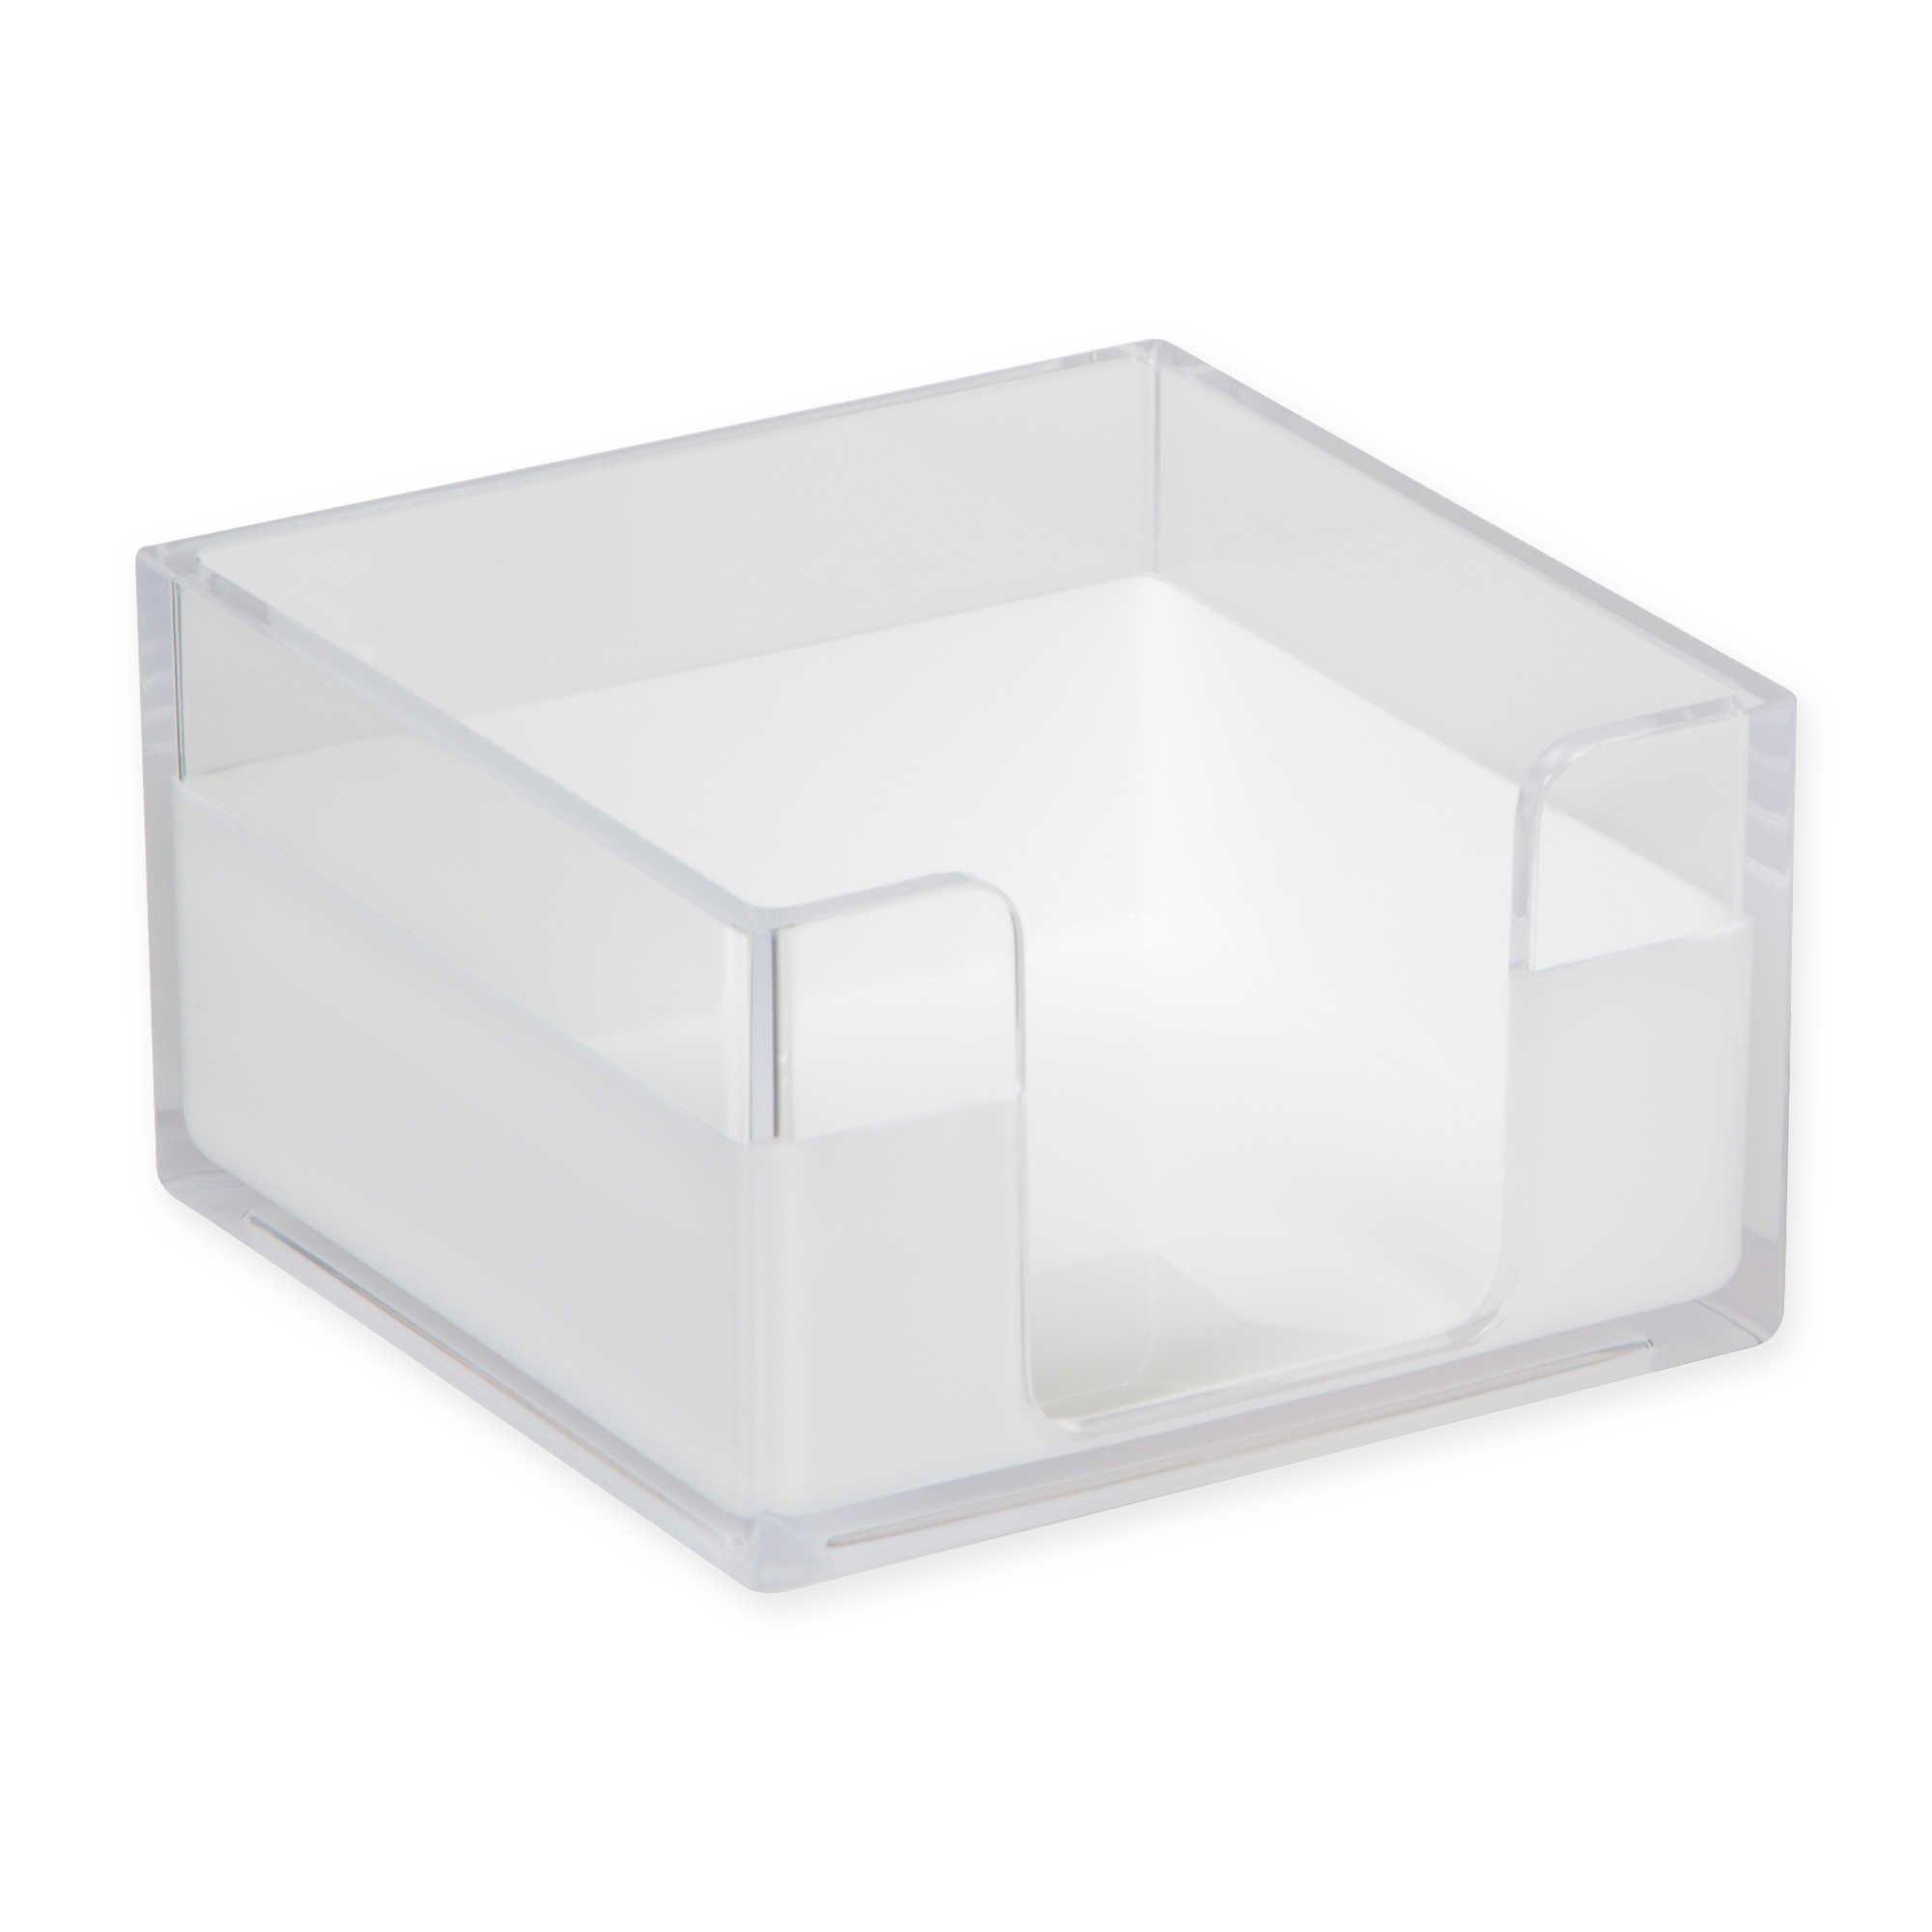 HomeCrate Modern Desk Organizer Memo Tray - Clear/White